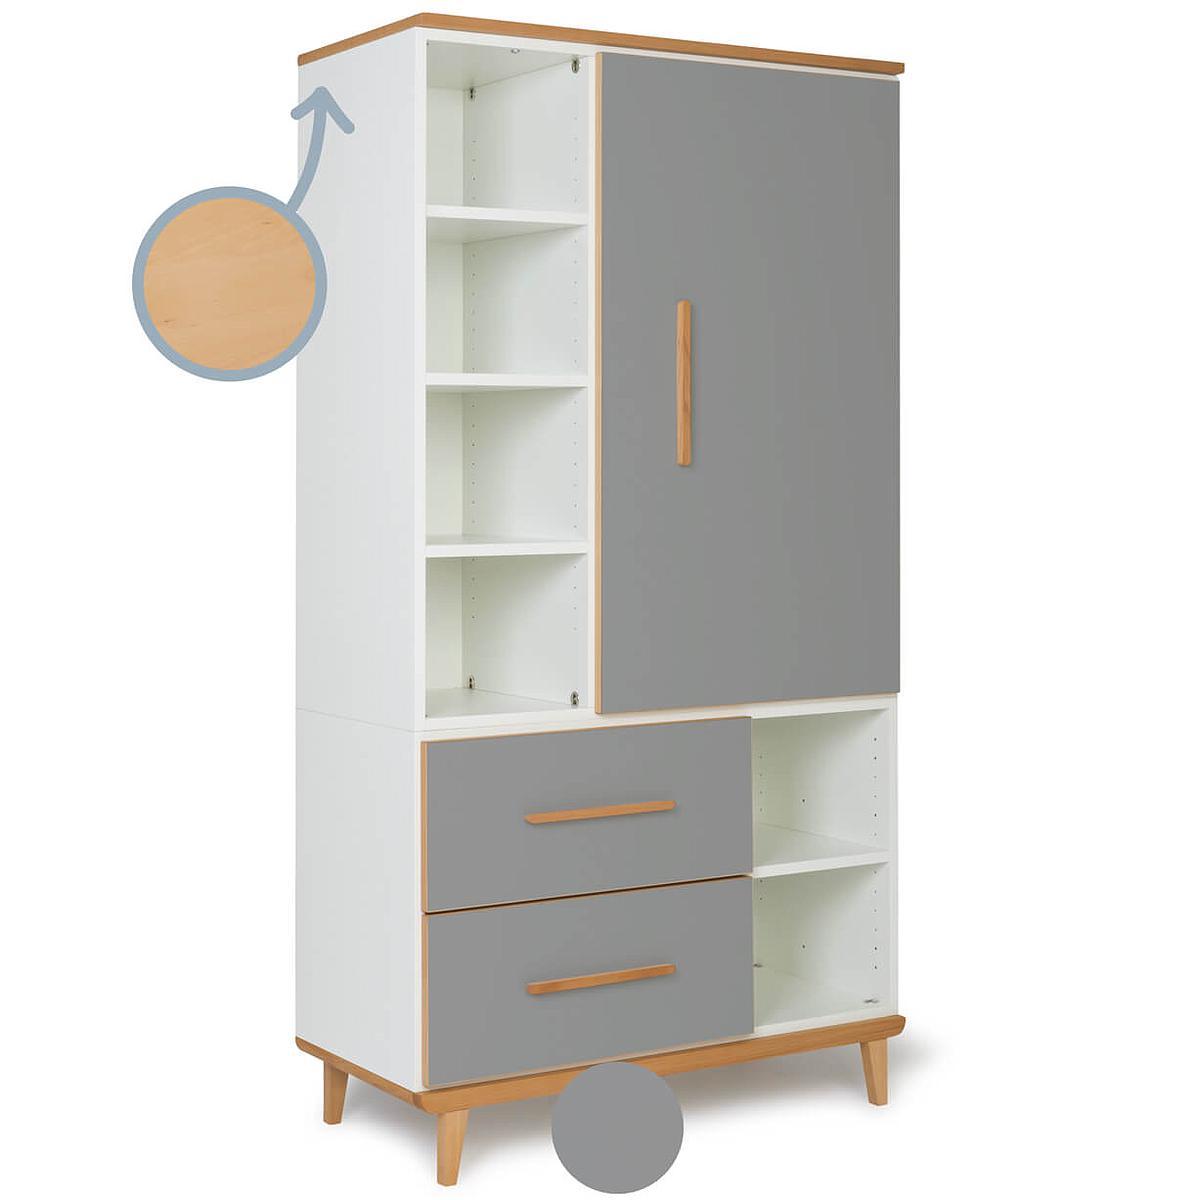 Armoire 173cm 1 porte 2 tiroirs NADO slate grey